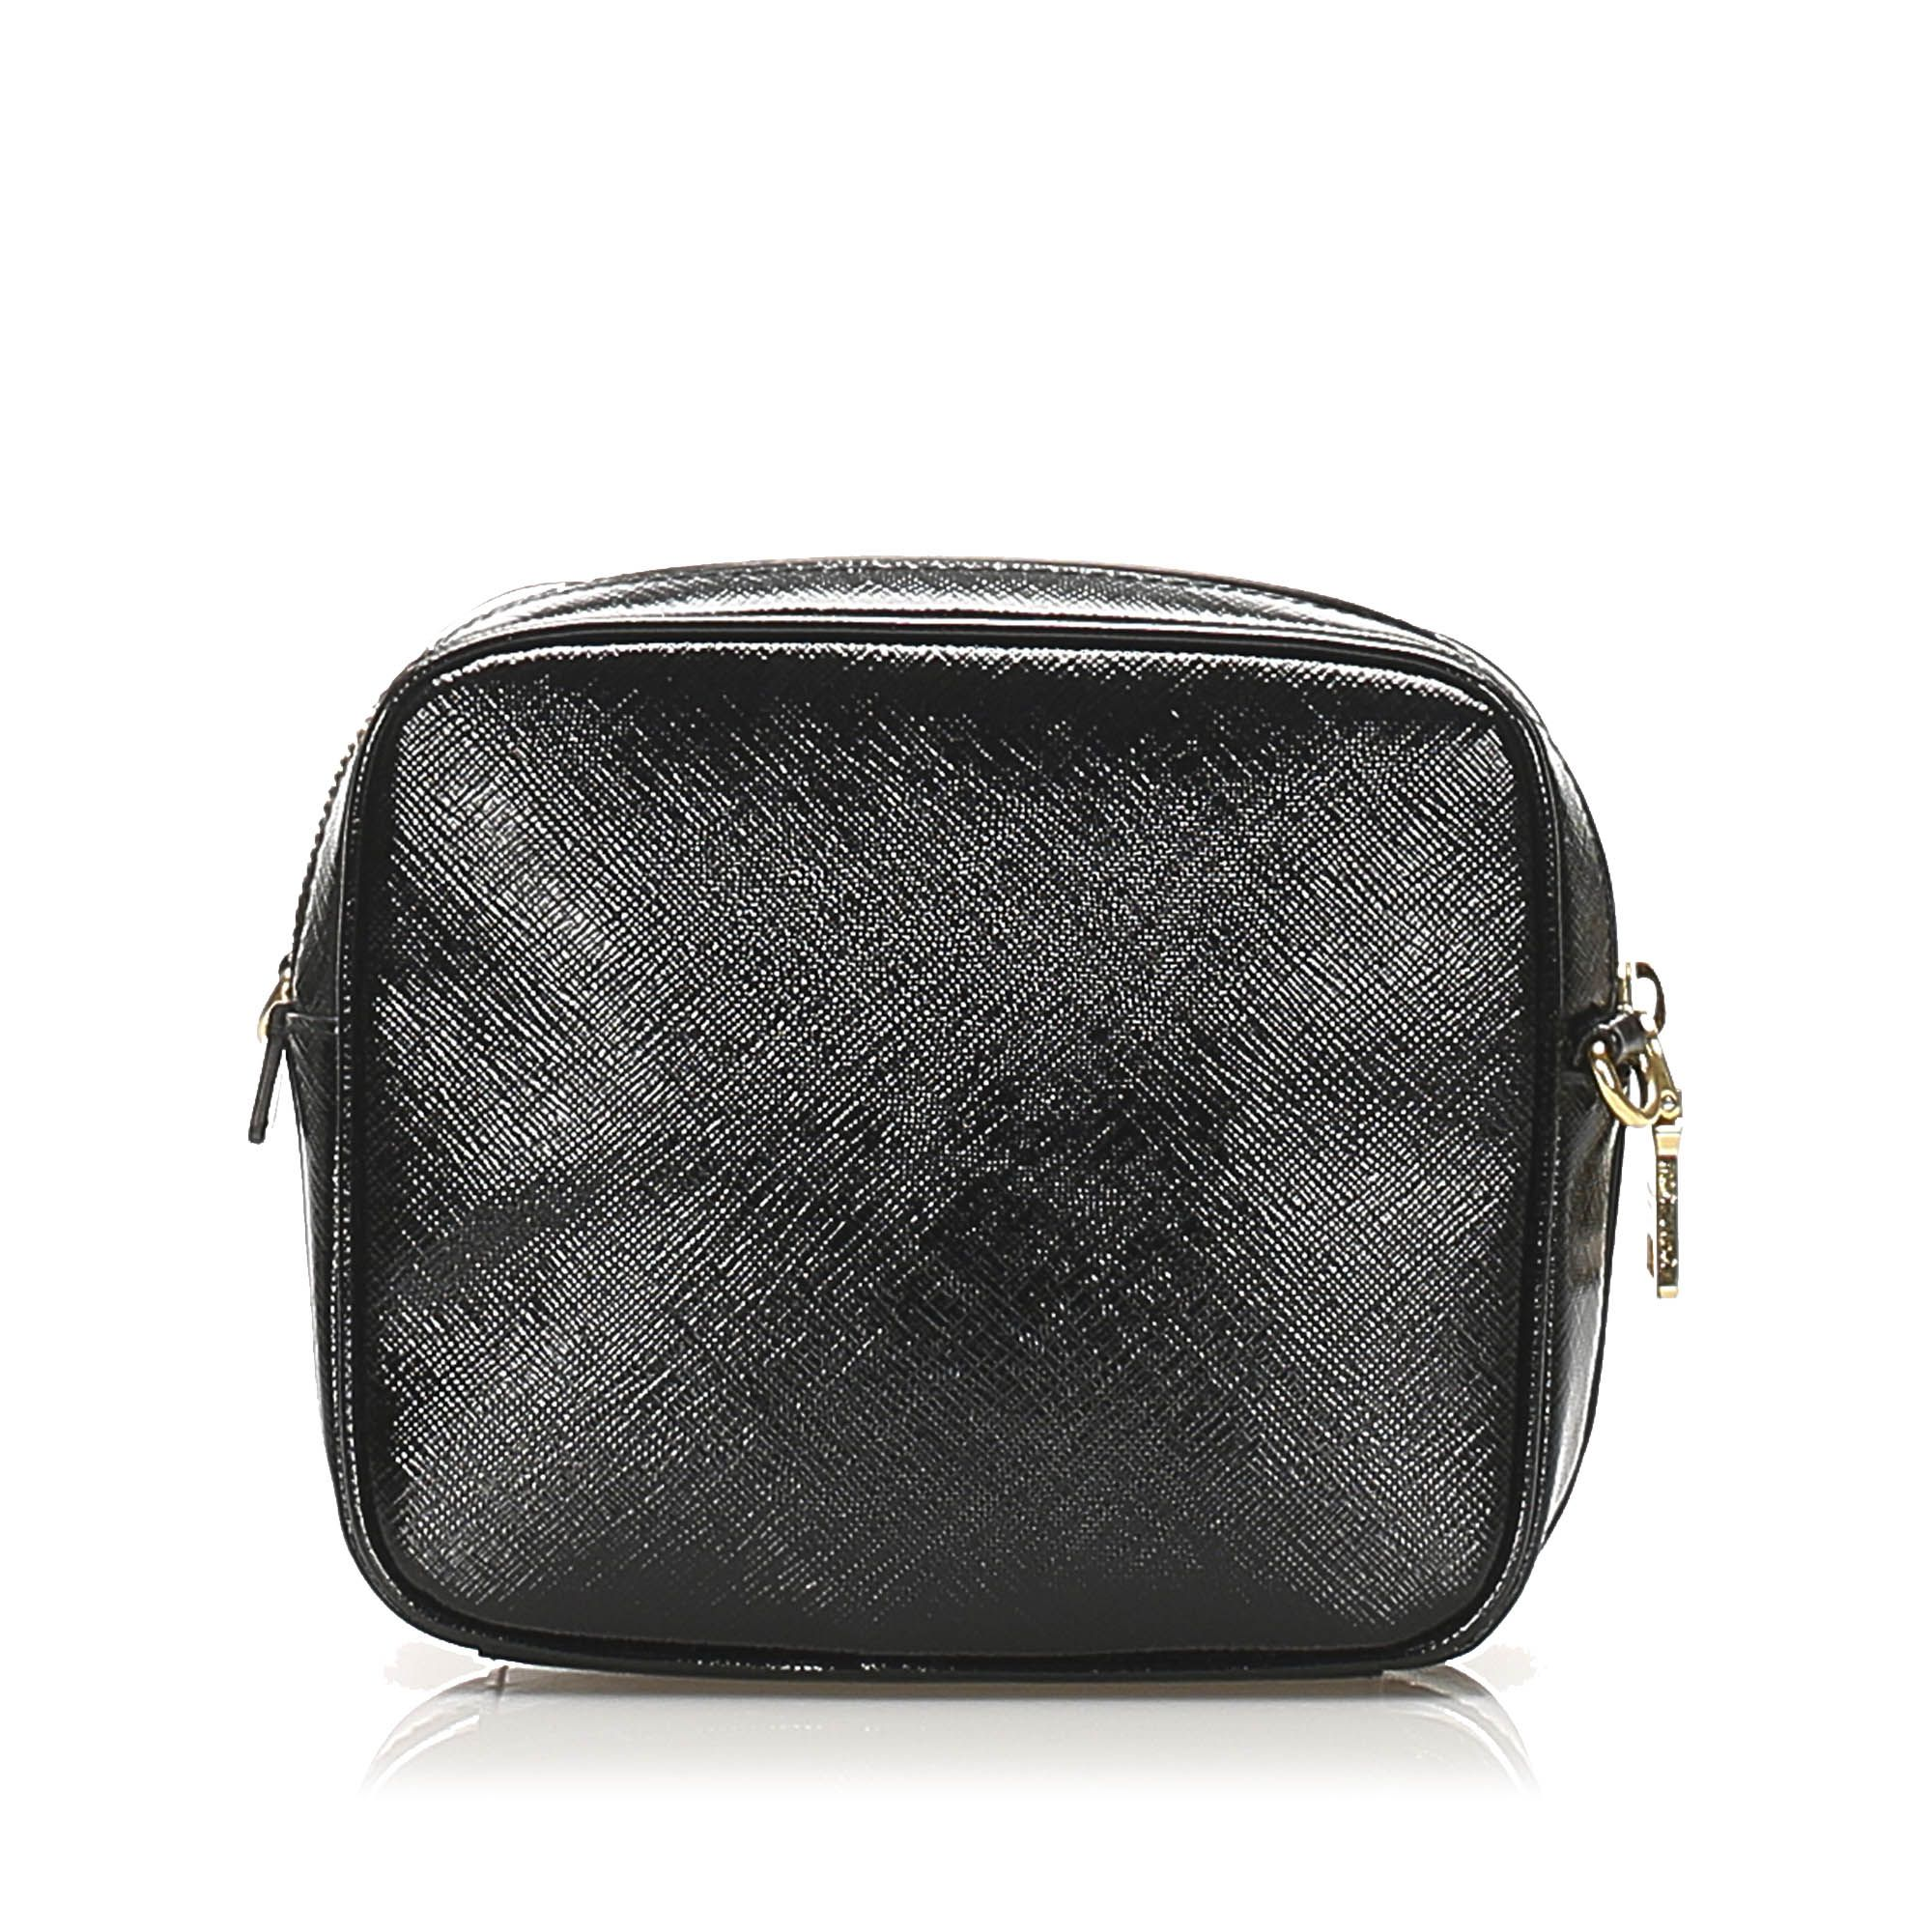 Vintage Prada Saffiano Vernice Crossbody Bag Black